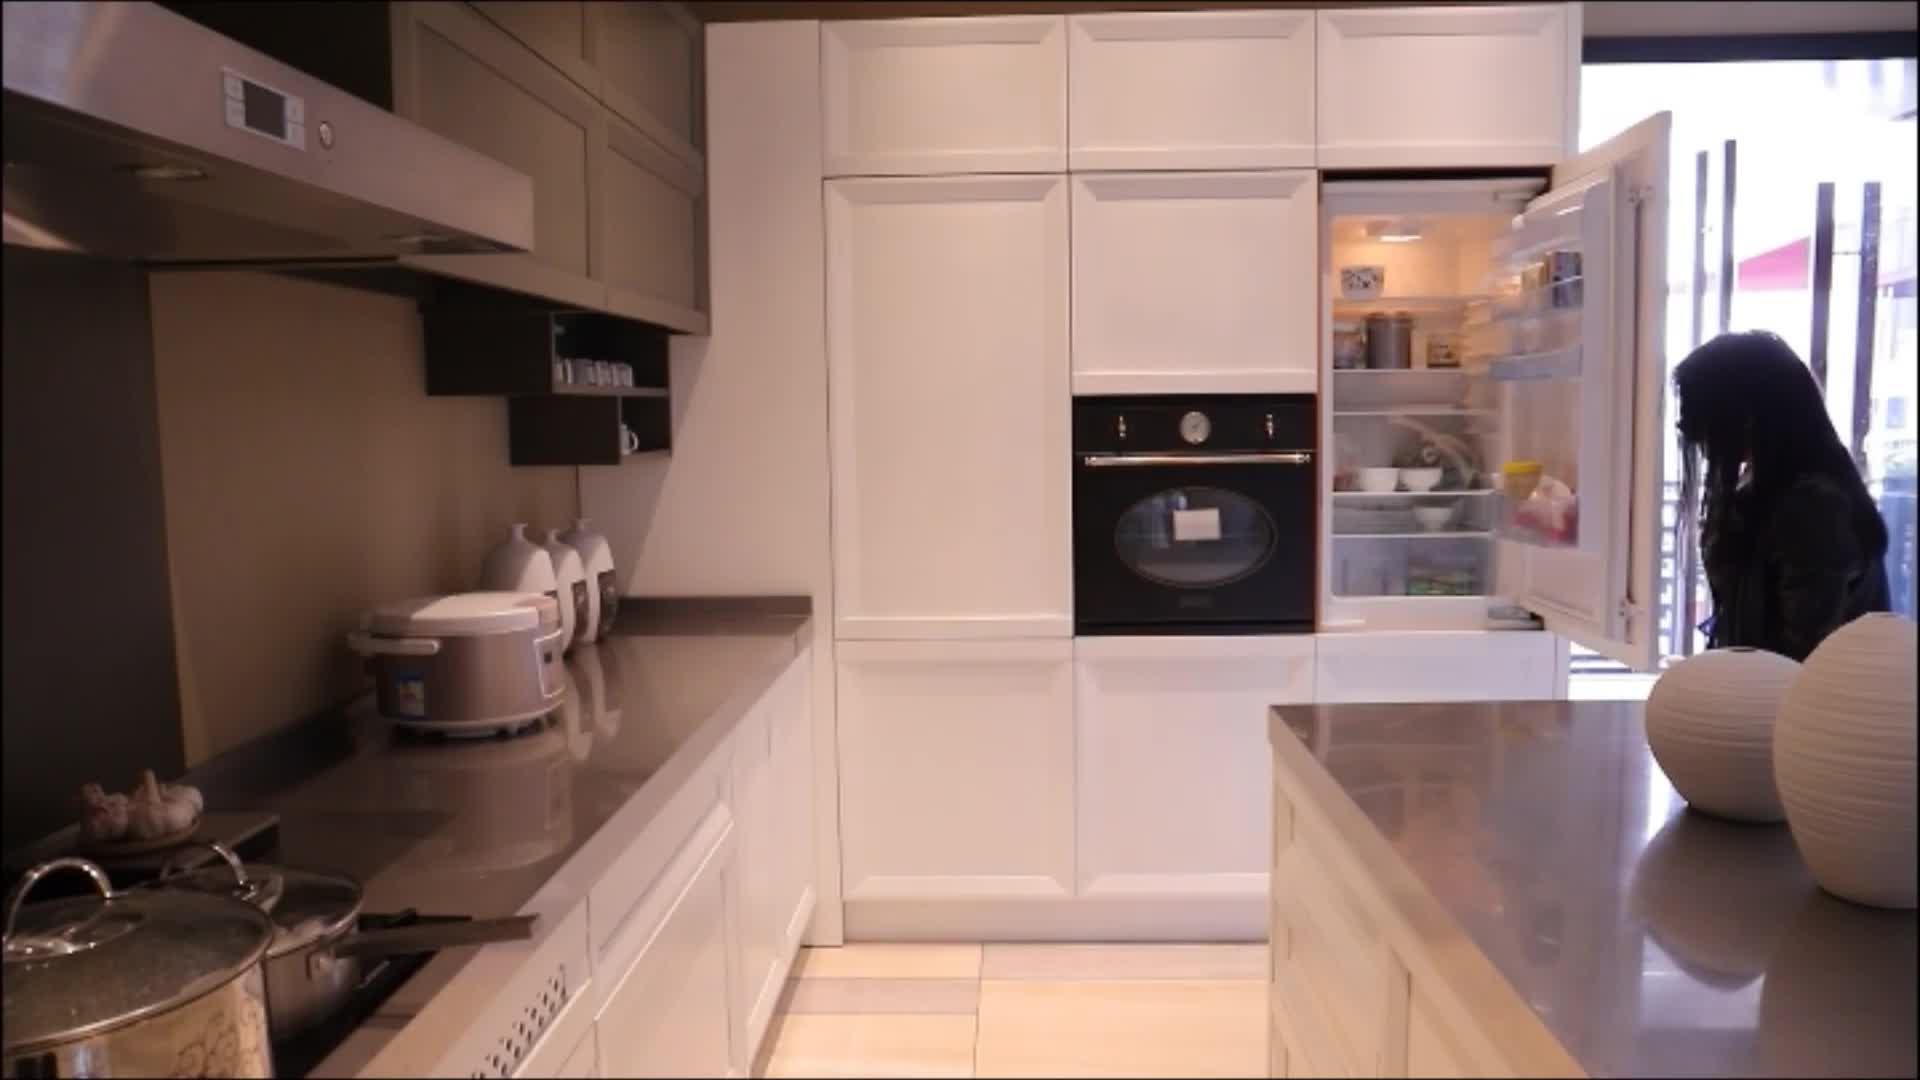 Nicocabinet Kustom Perabot Dapur Desain Dapur Modular Lembut Penutupan Kayu Solid Lemari Dapur